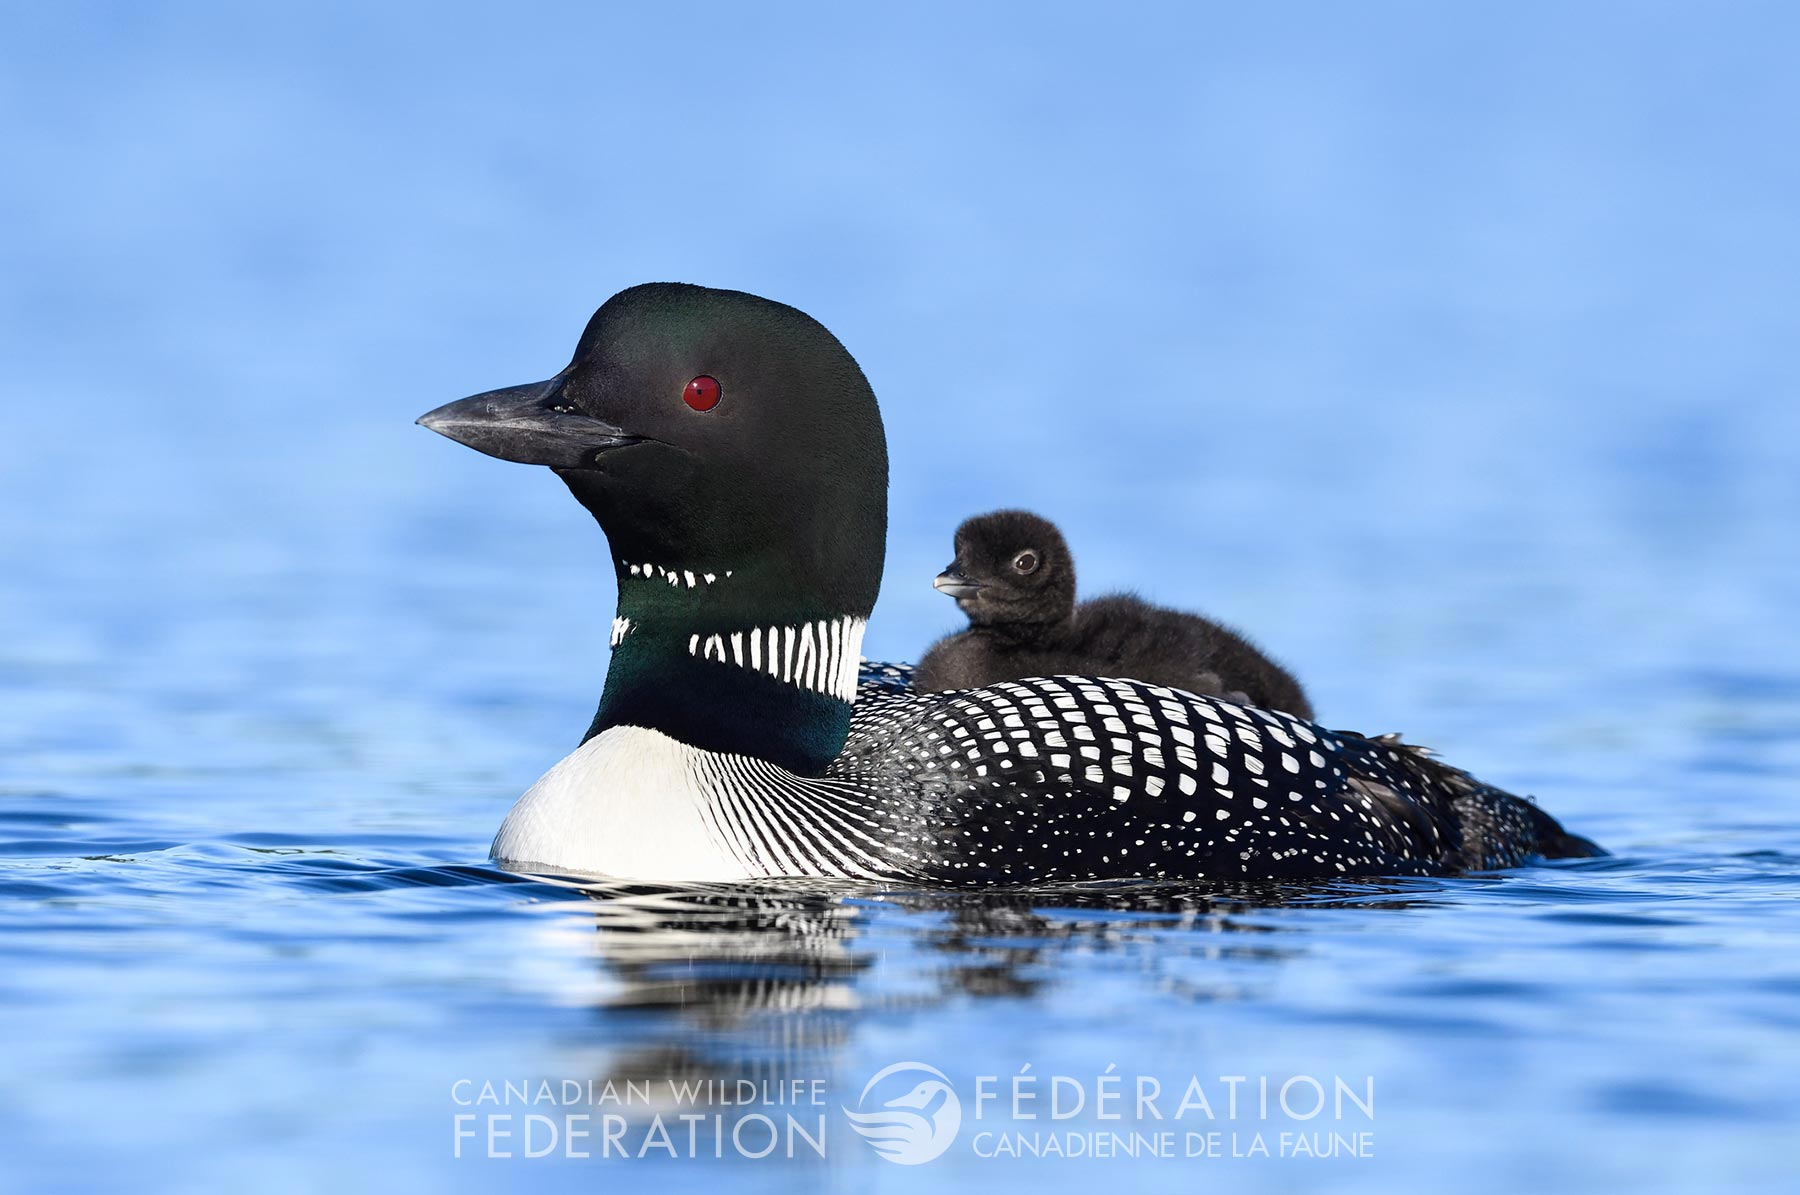 loon-parent-chick-water-bird.jpg